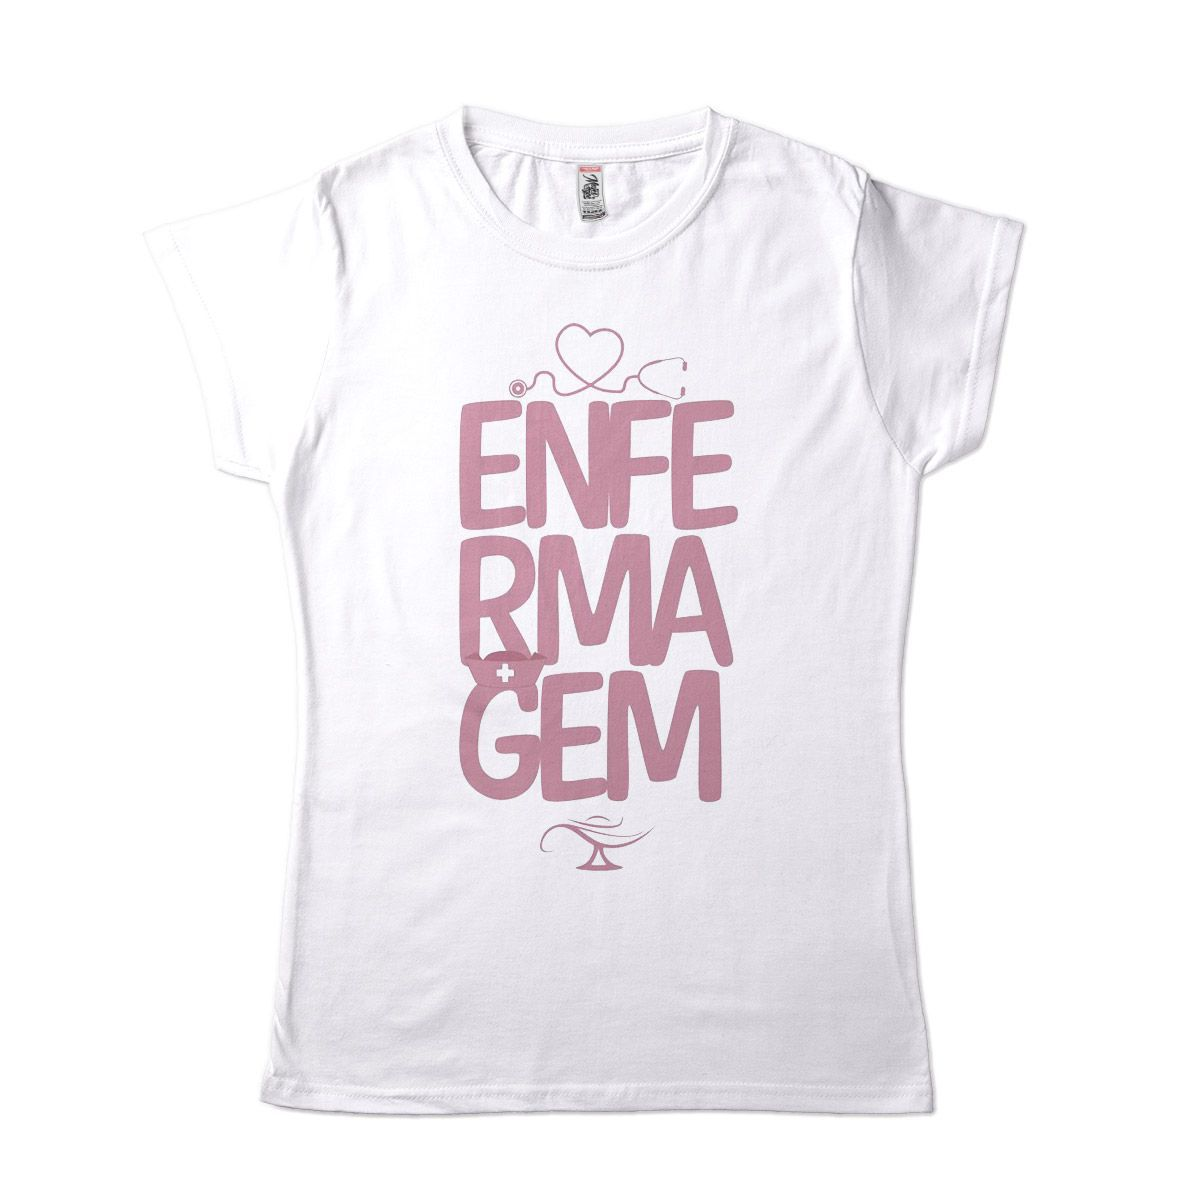 camiseta de enfermagem feminina